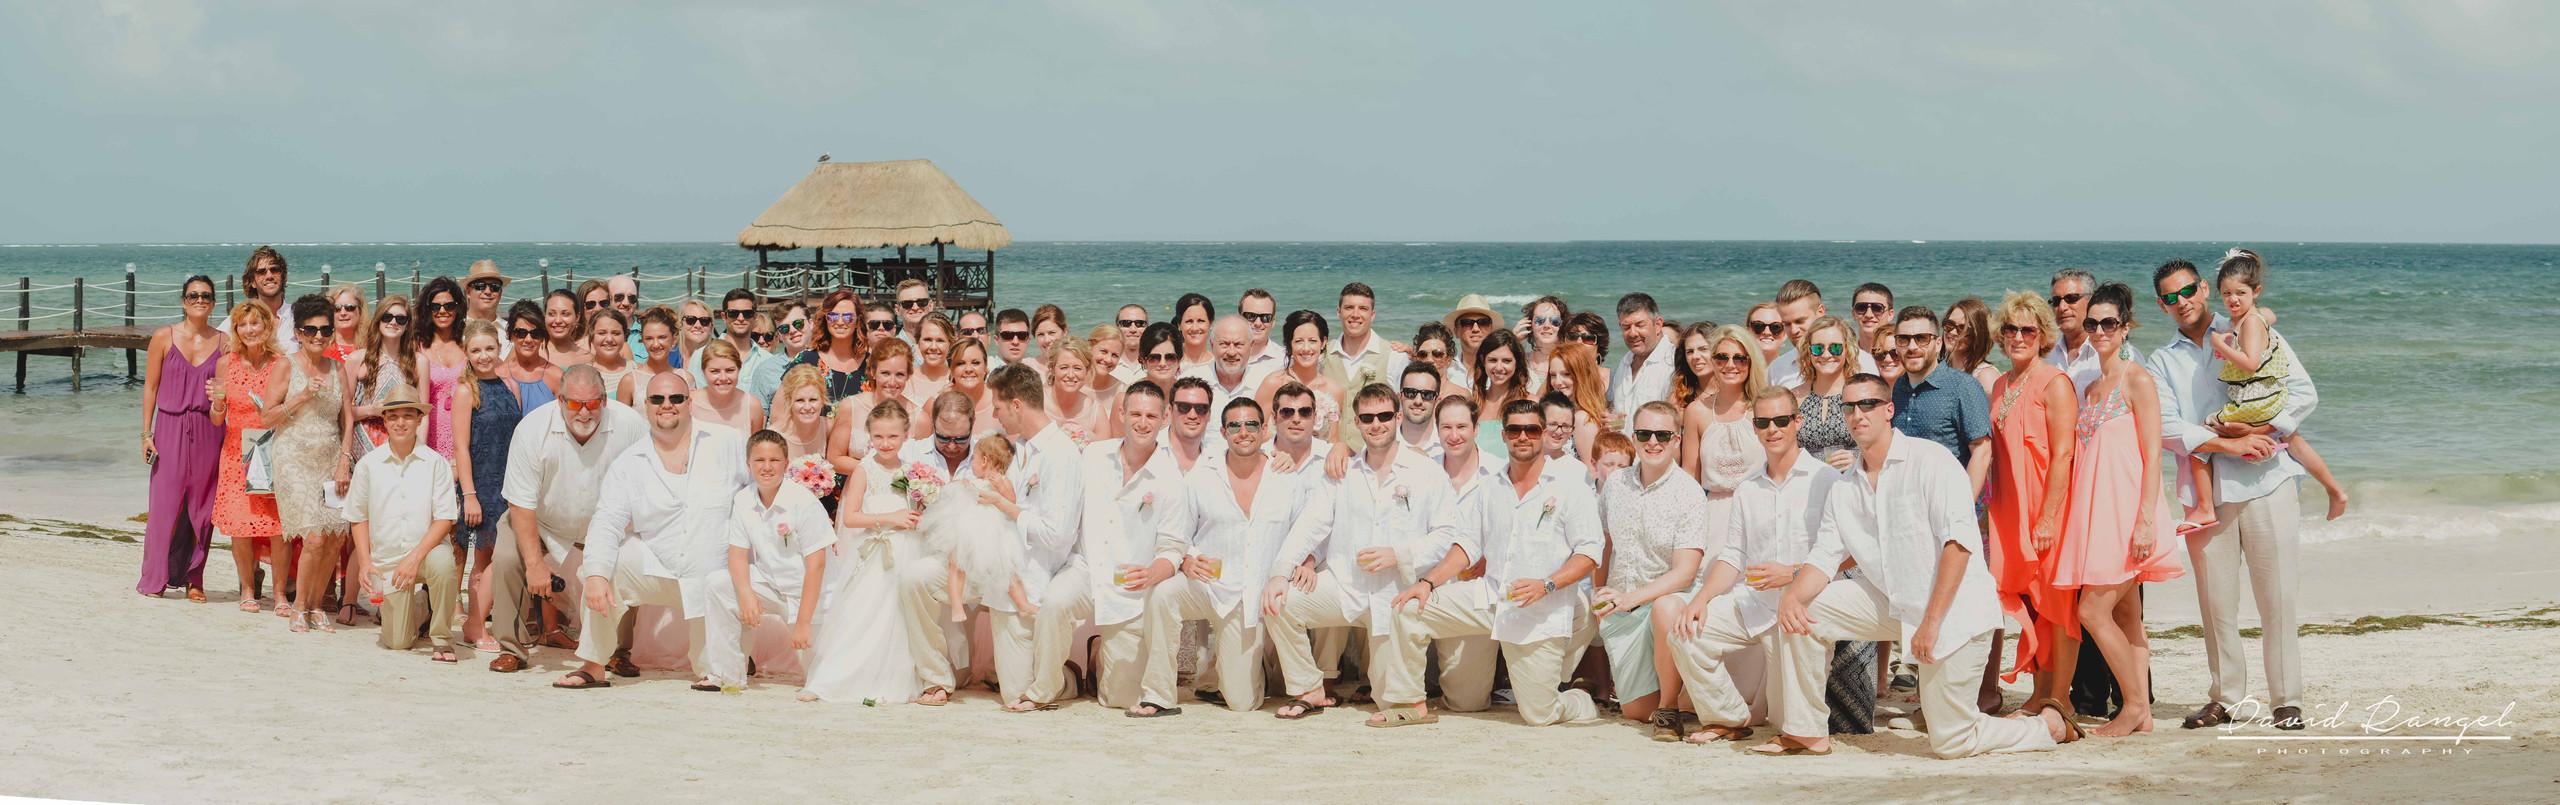 wedding+group+photo